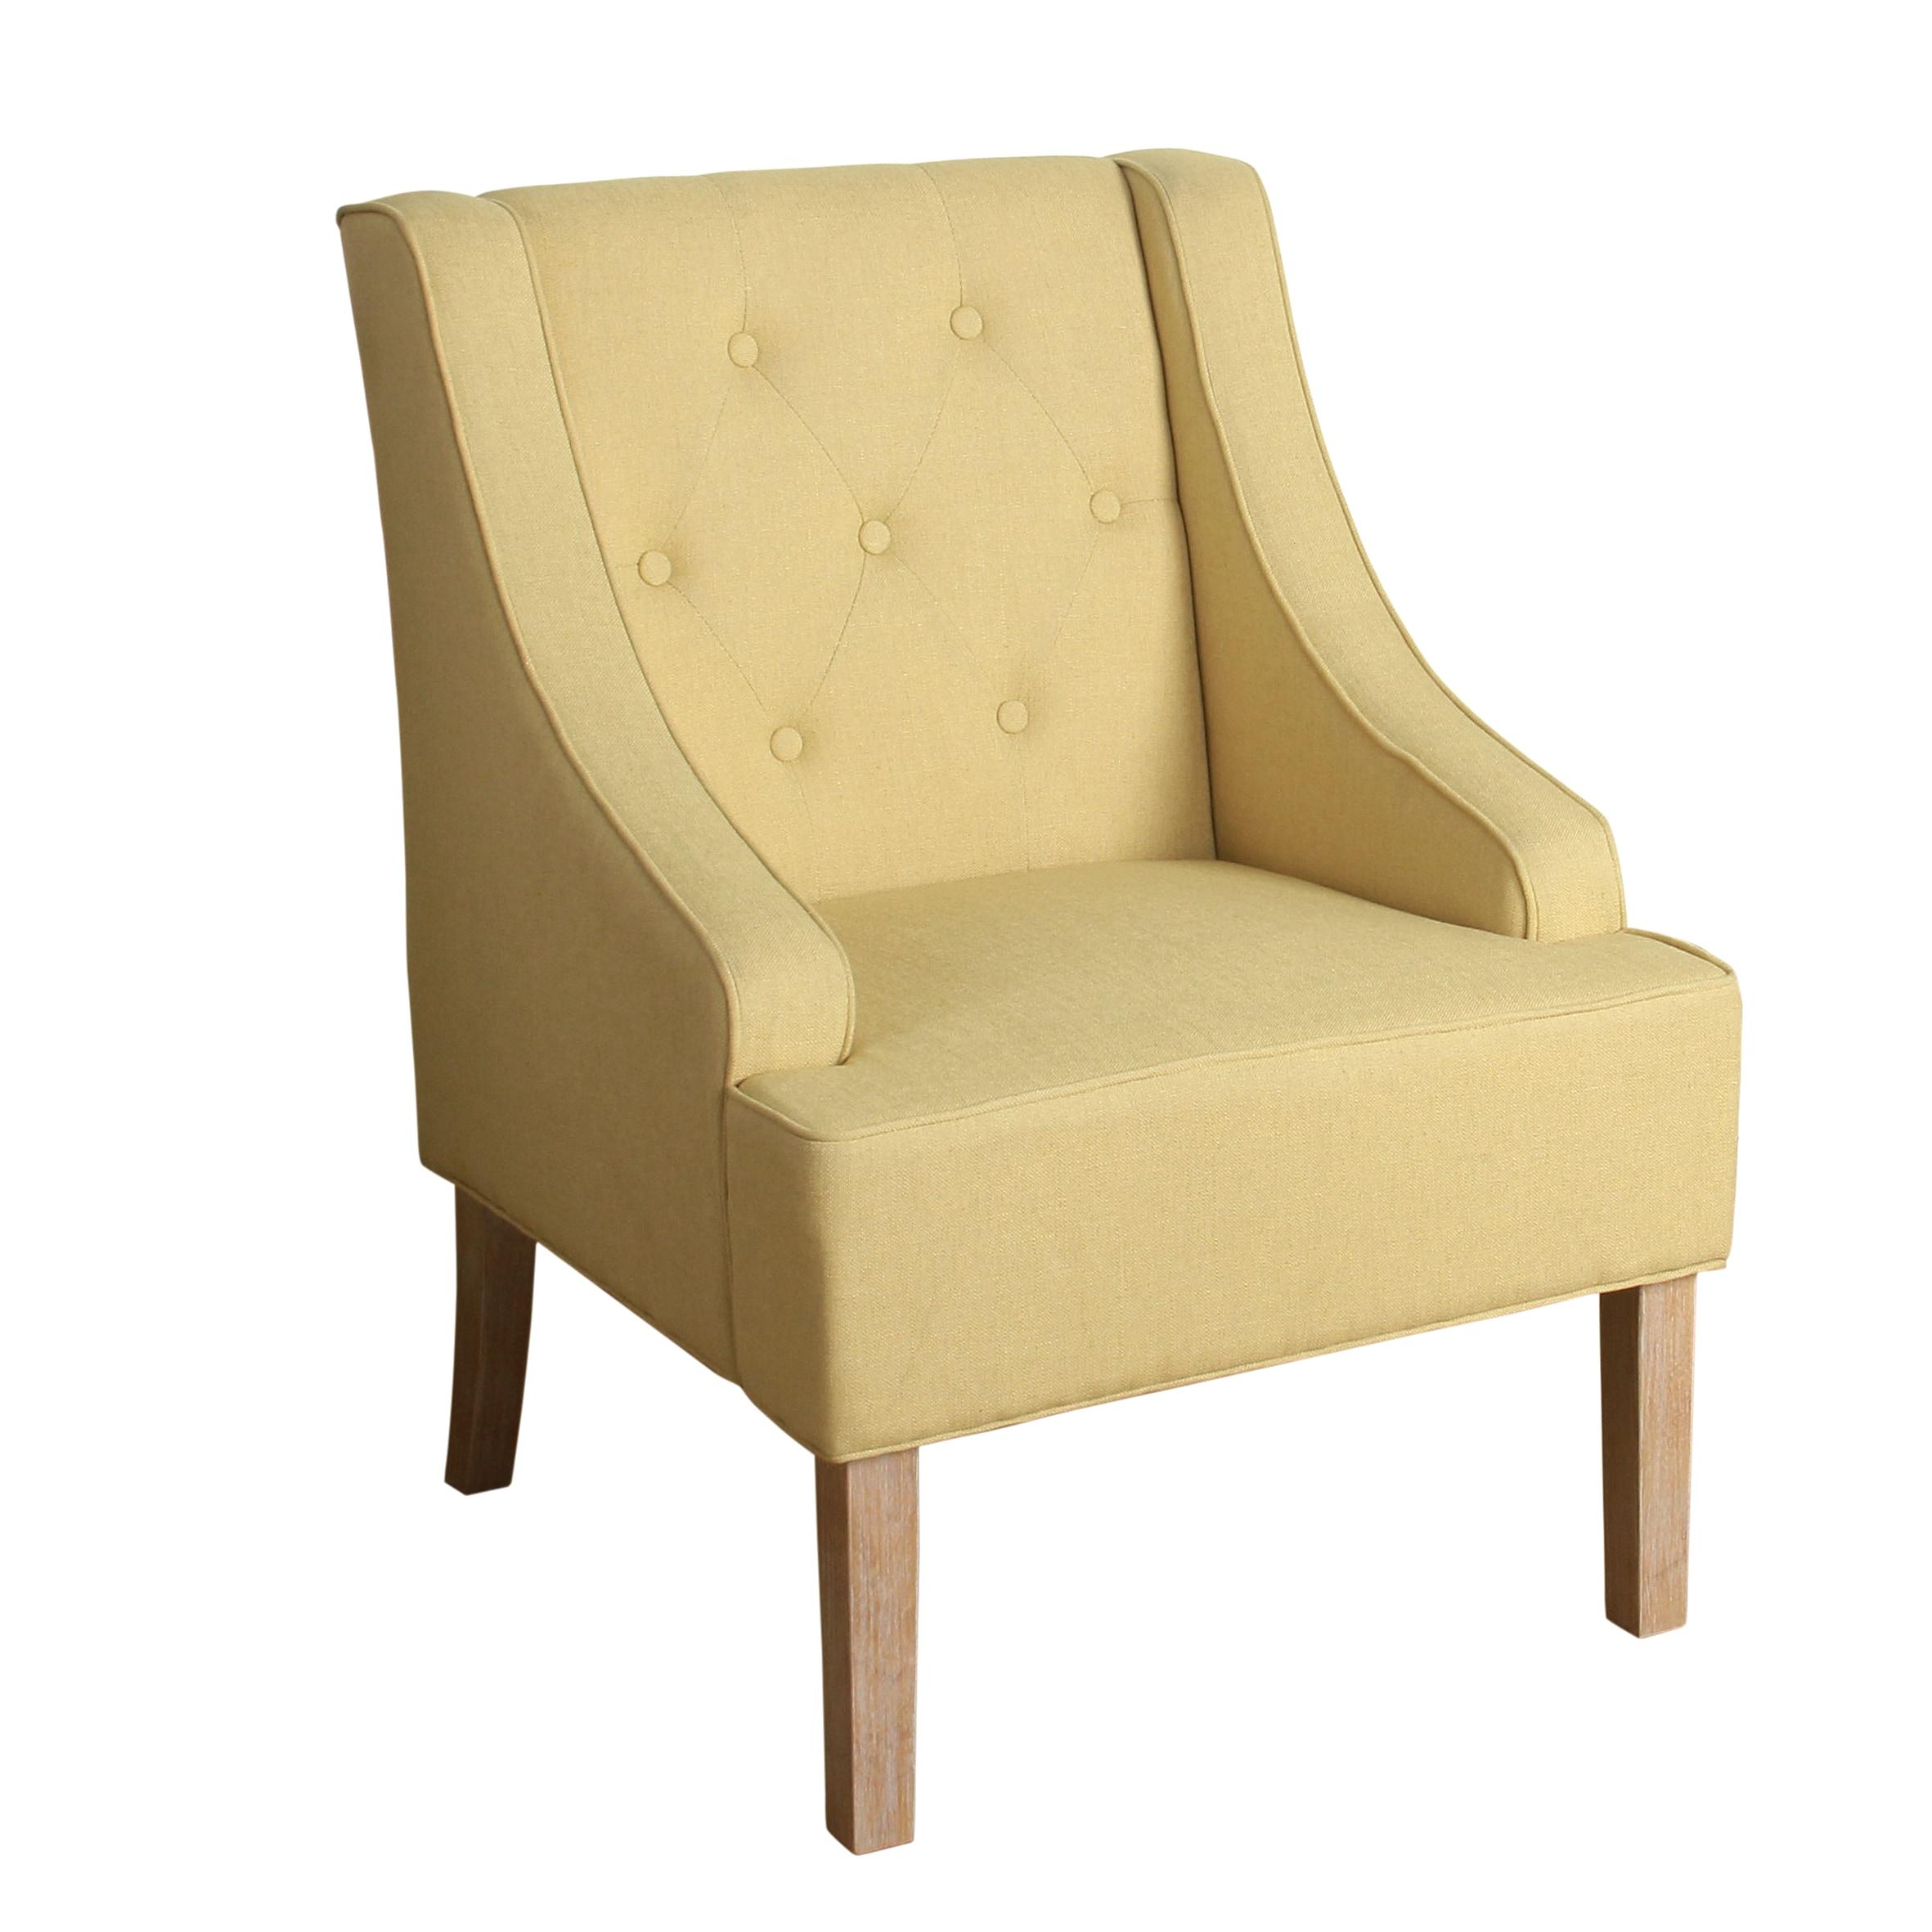 Porch U0026 Den Los Feliz Lyric Tufted Swoop Arm Accent Chair In Soft Yellow